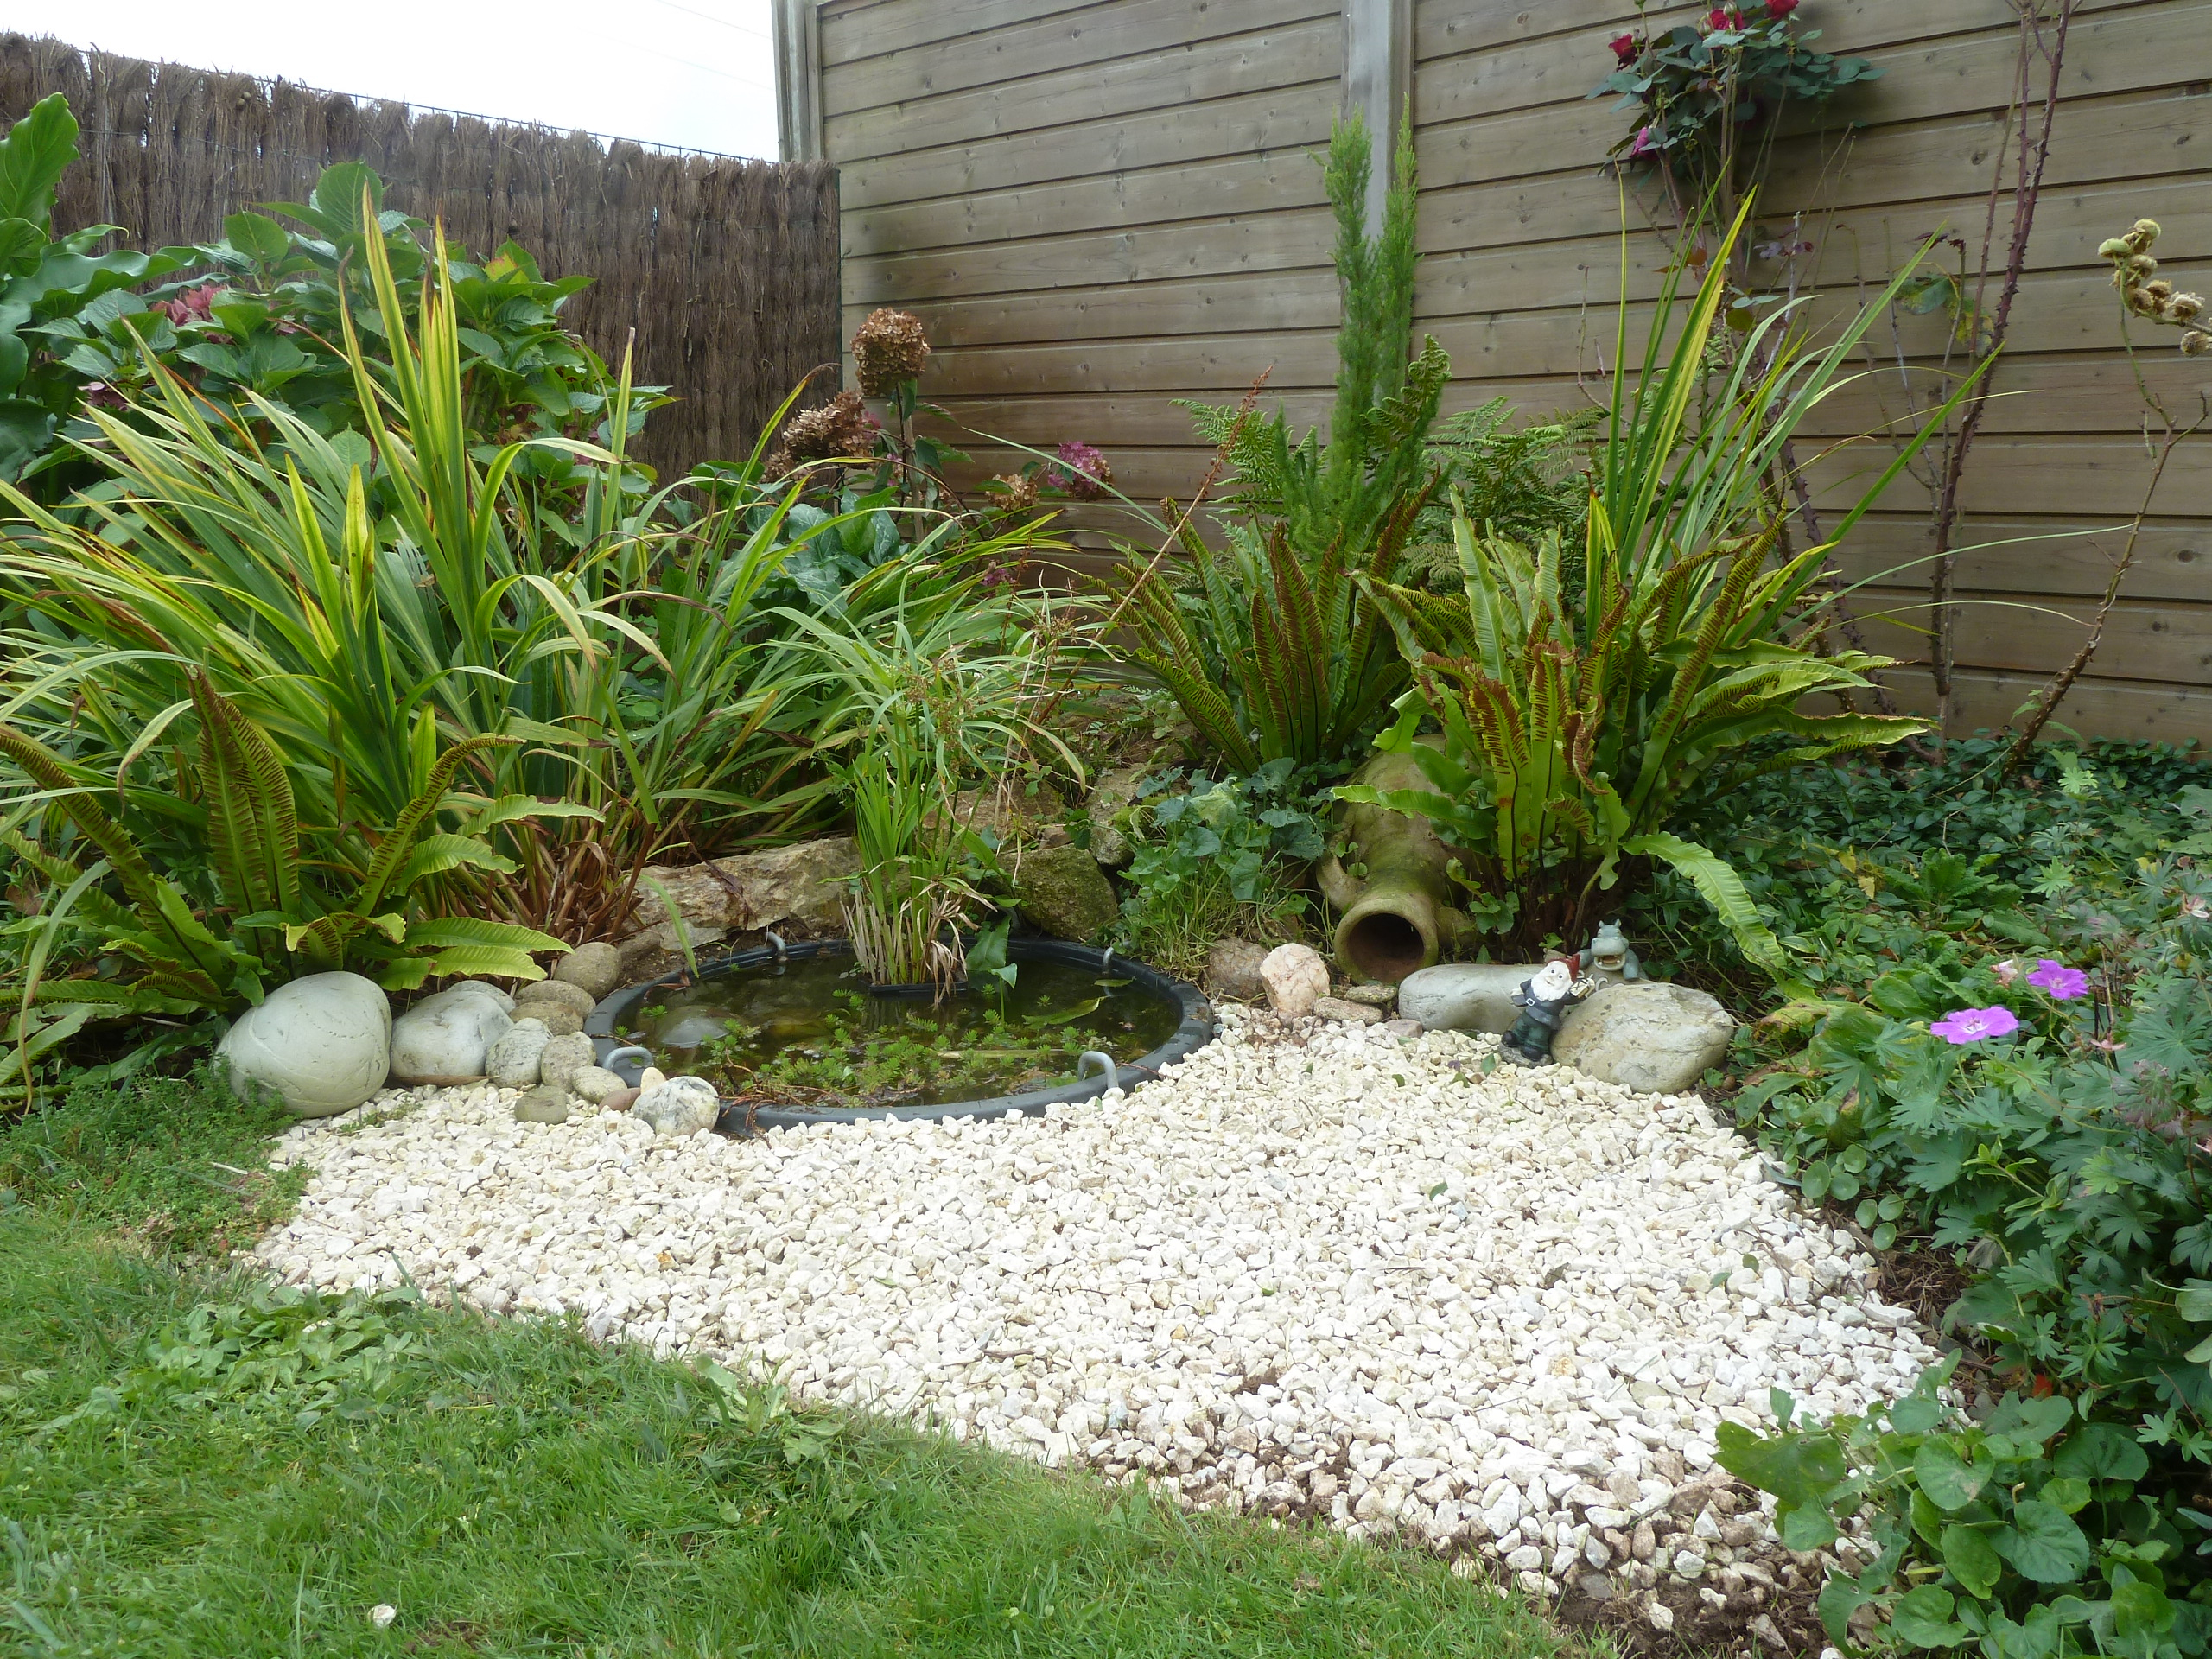 Une Saison Au Jardin | Notre Petit Jardin Breton concernant Petit Jardin Avec Bassin